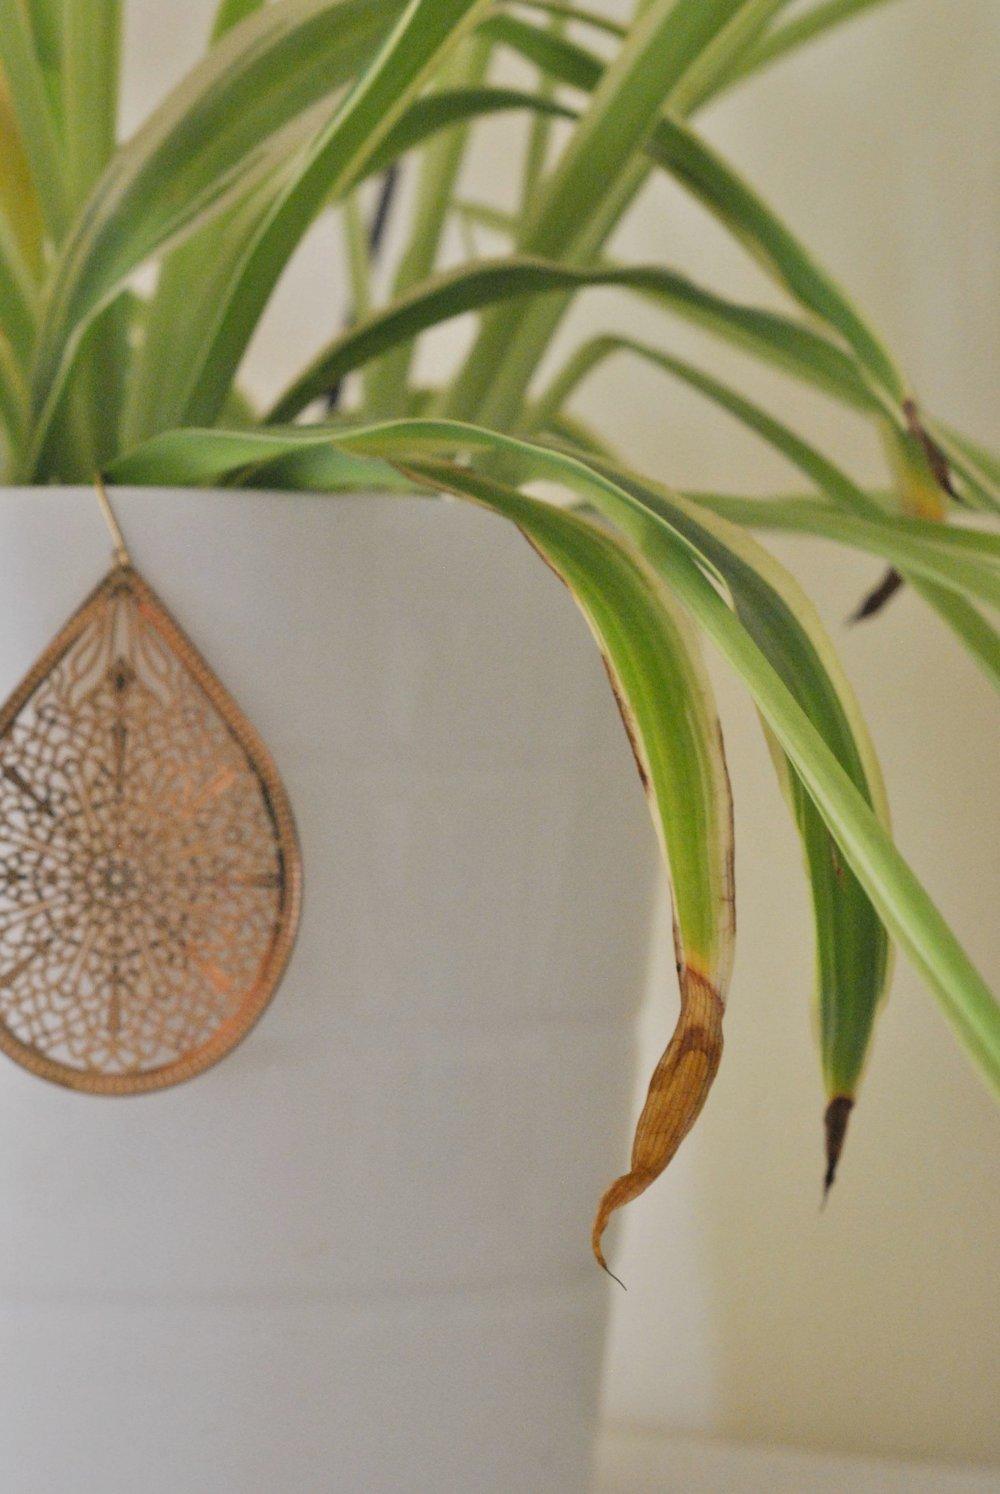 Clorofito - da Urban Plant Life